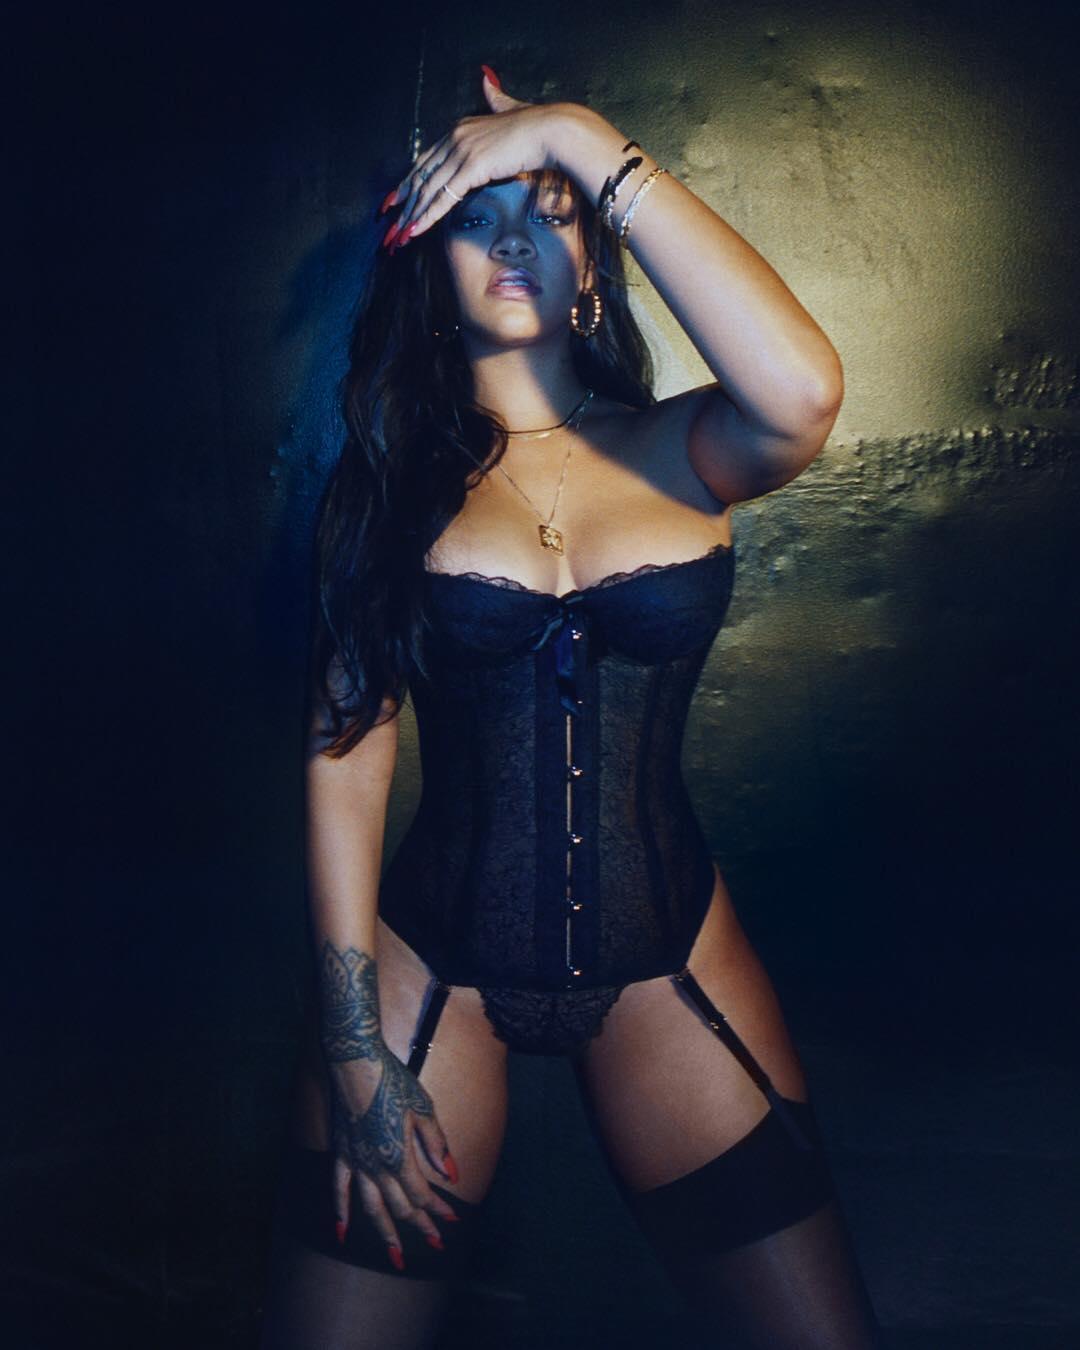 Rihanna - Savage X Fenty photoshoot